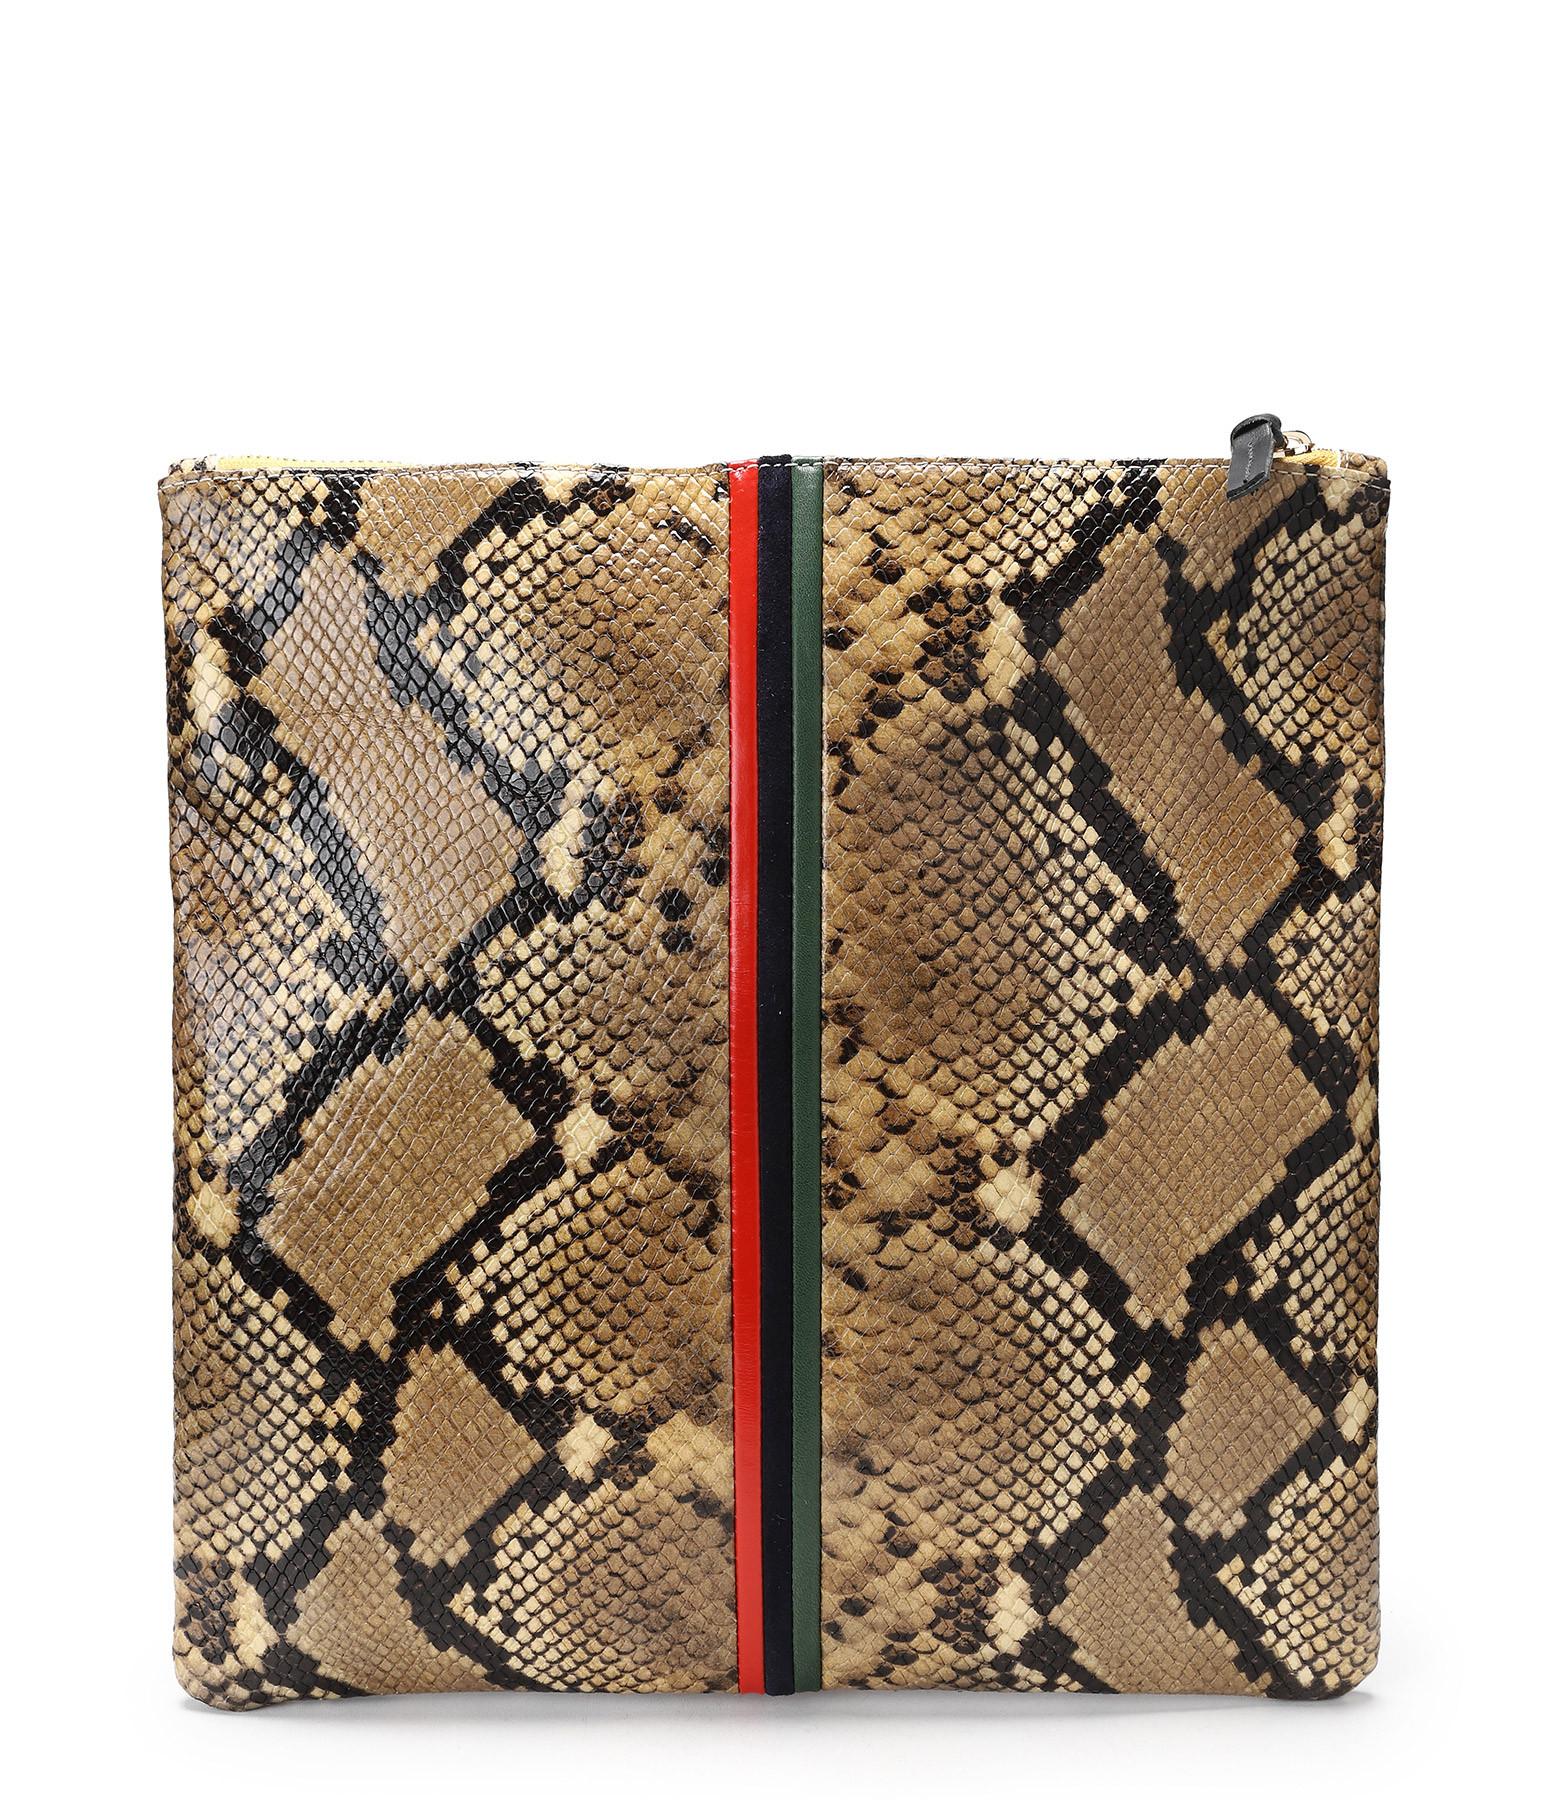 CLARE V. - Pochette Imprimé Serpent Bandes Vert Navy Cerise